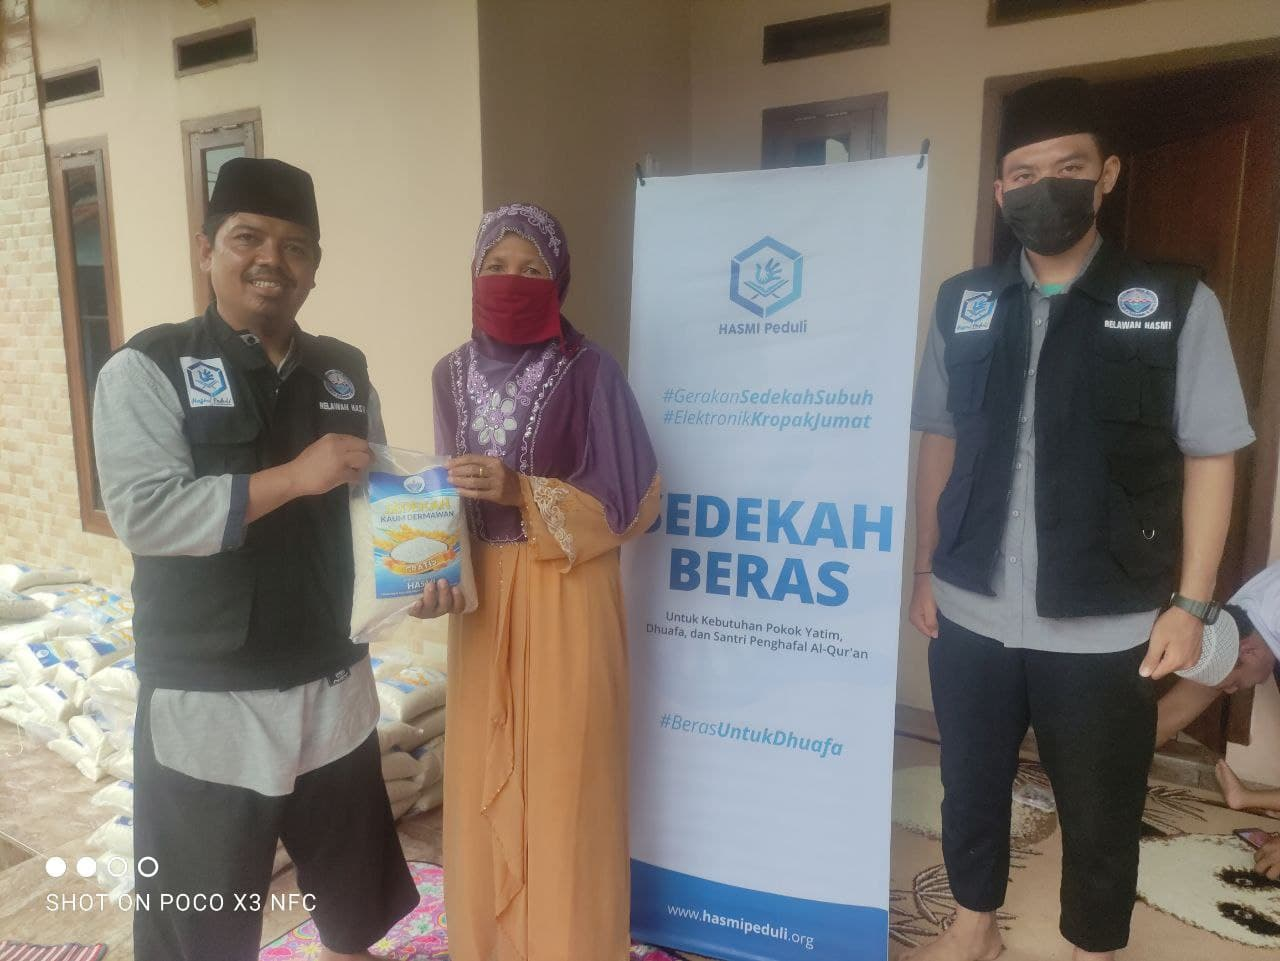 Laporan Kegiatan Sosial Hasmi DPW Tangerang